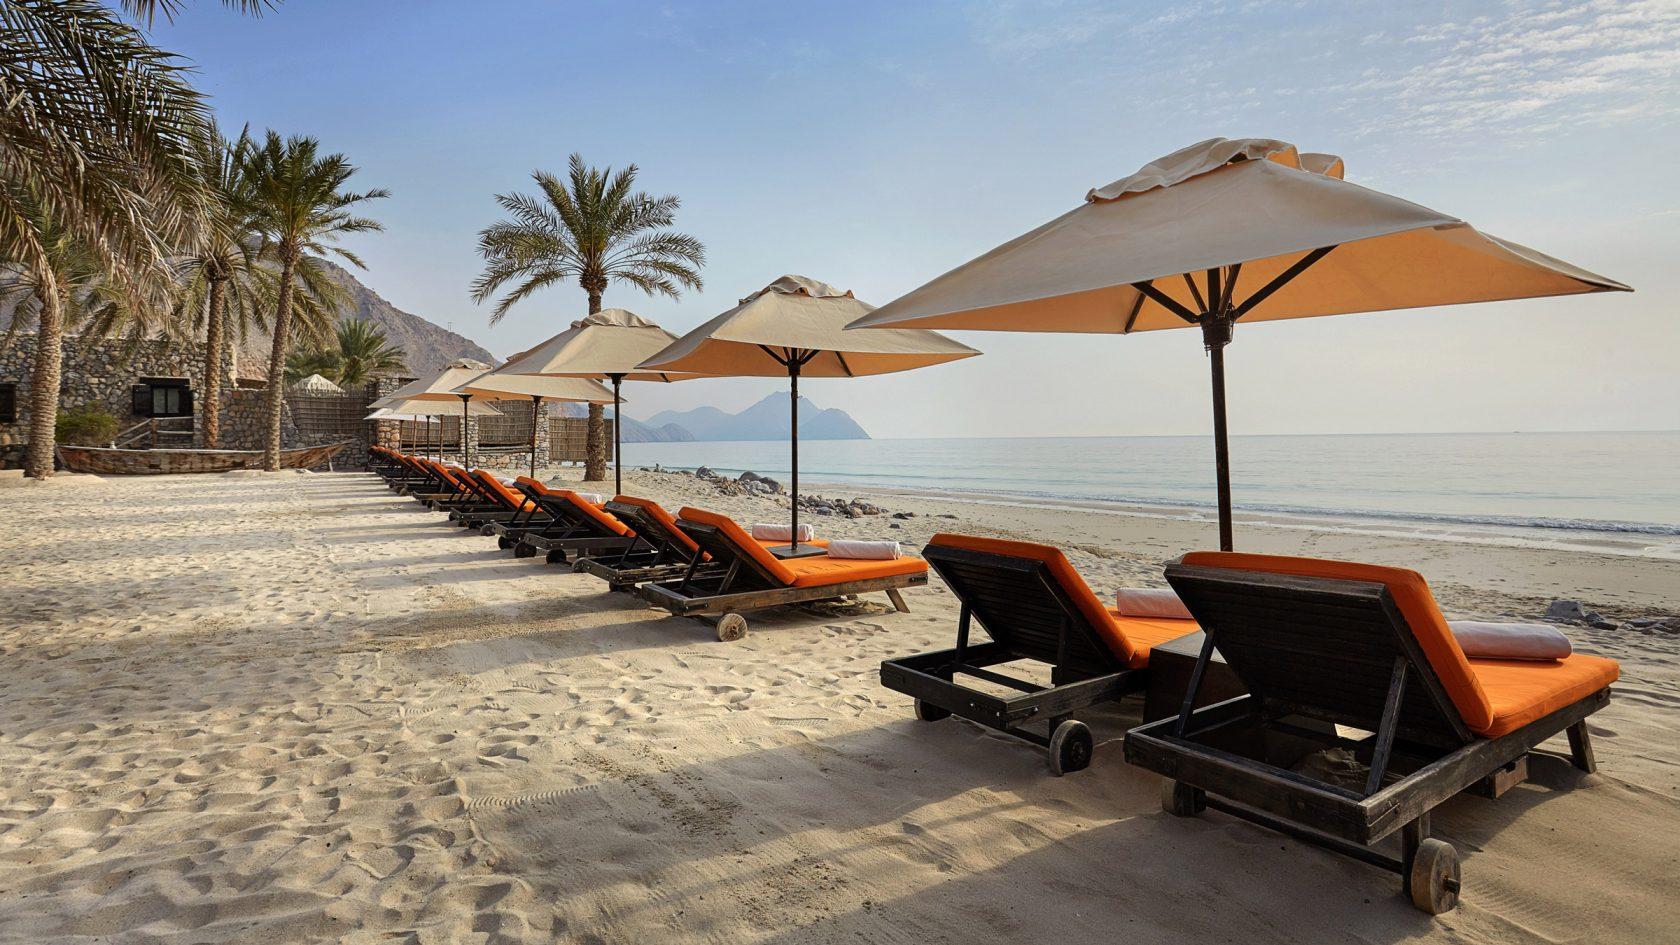 Luxushotel Six Senses Zighy Bay, Musandam/ Oman